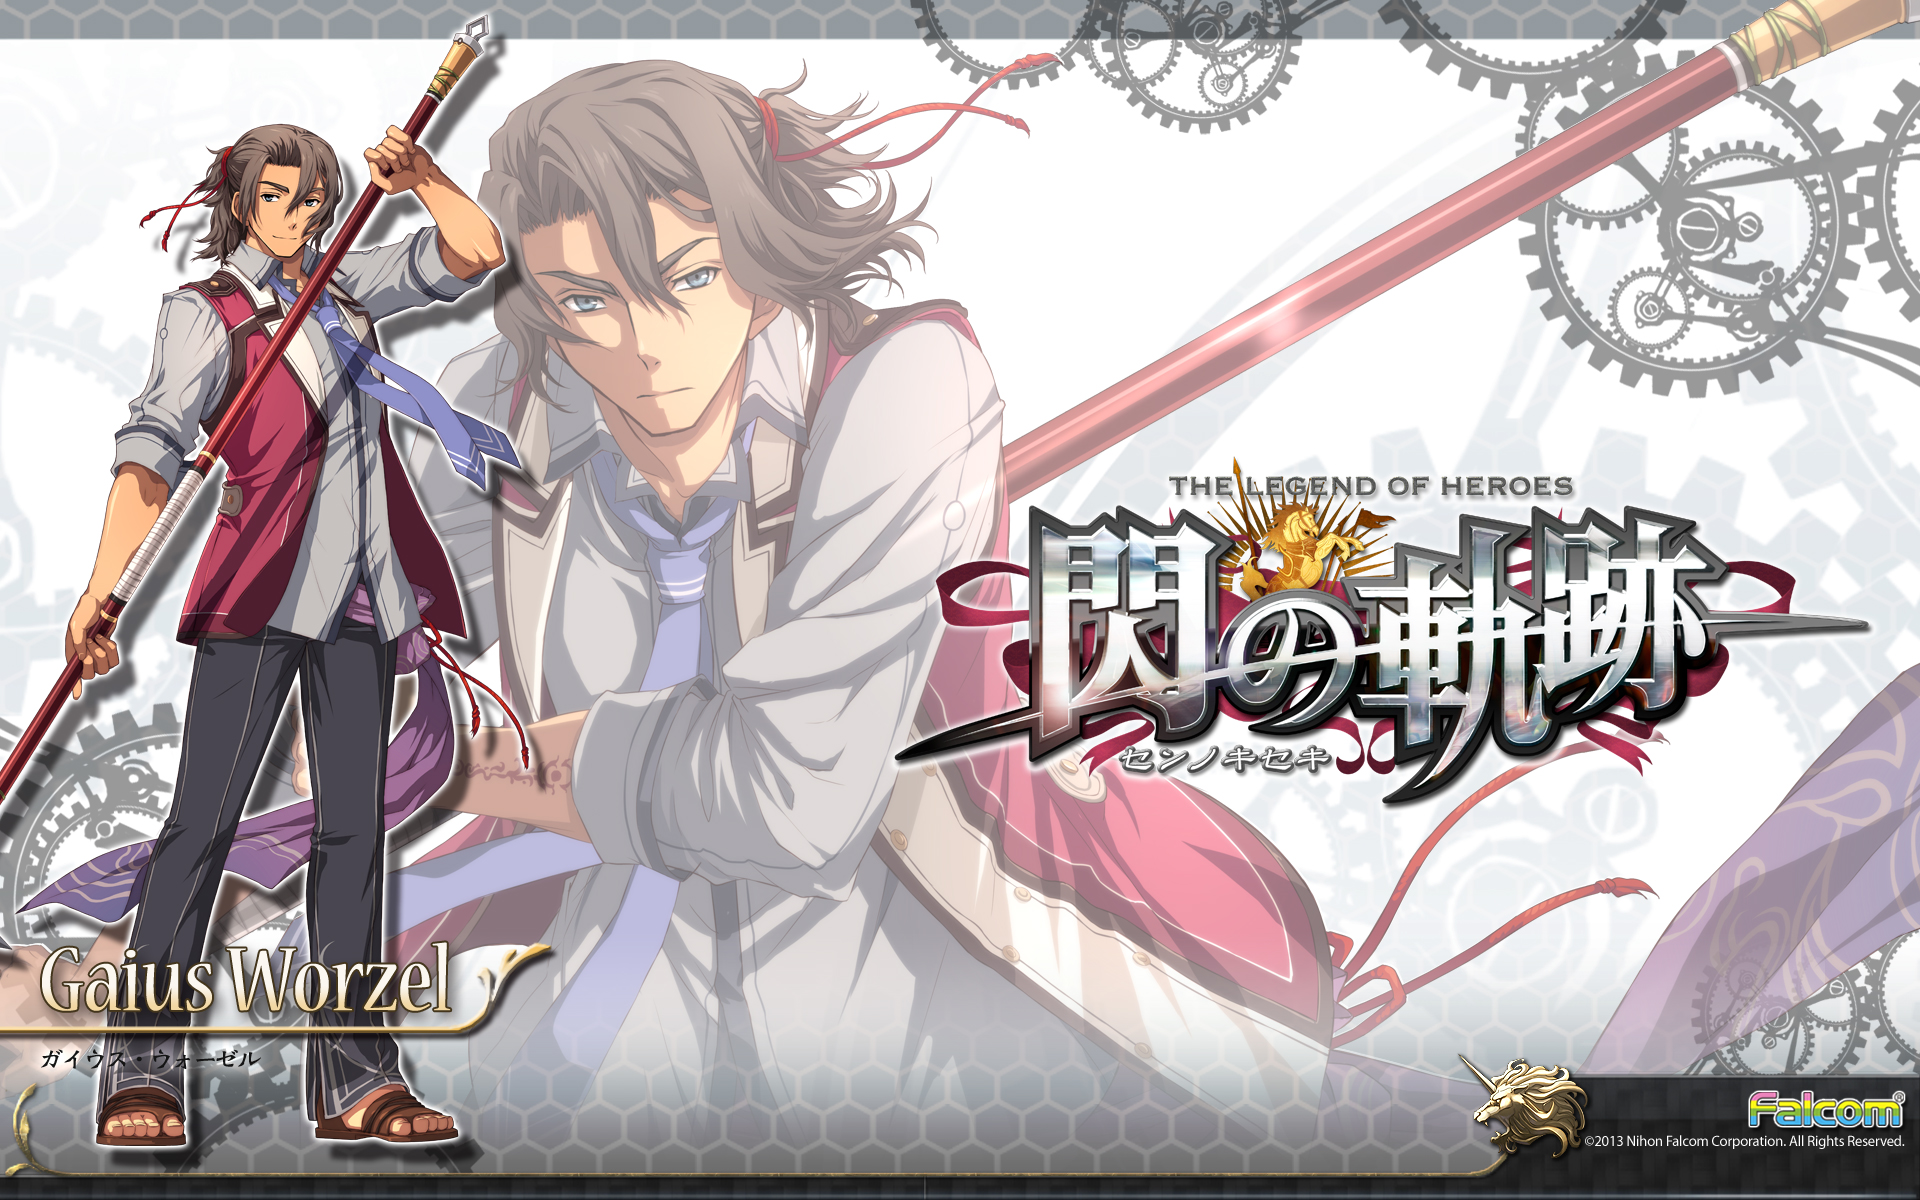 Gaius Worzel Eiyuu Densetsu Sen No Kiseki Wallpaper